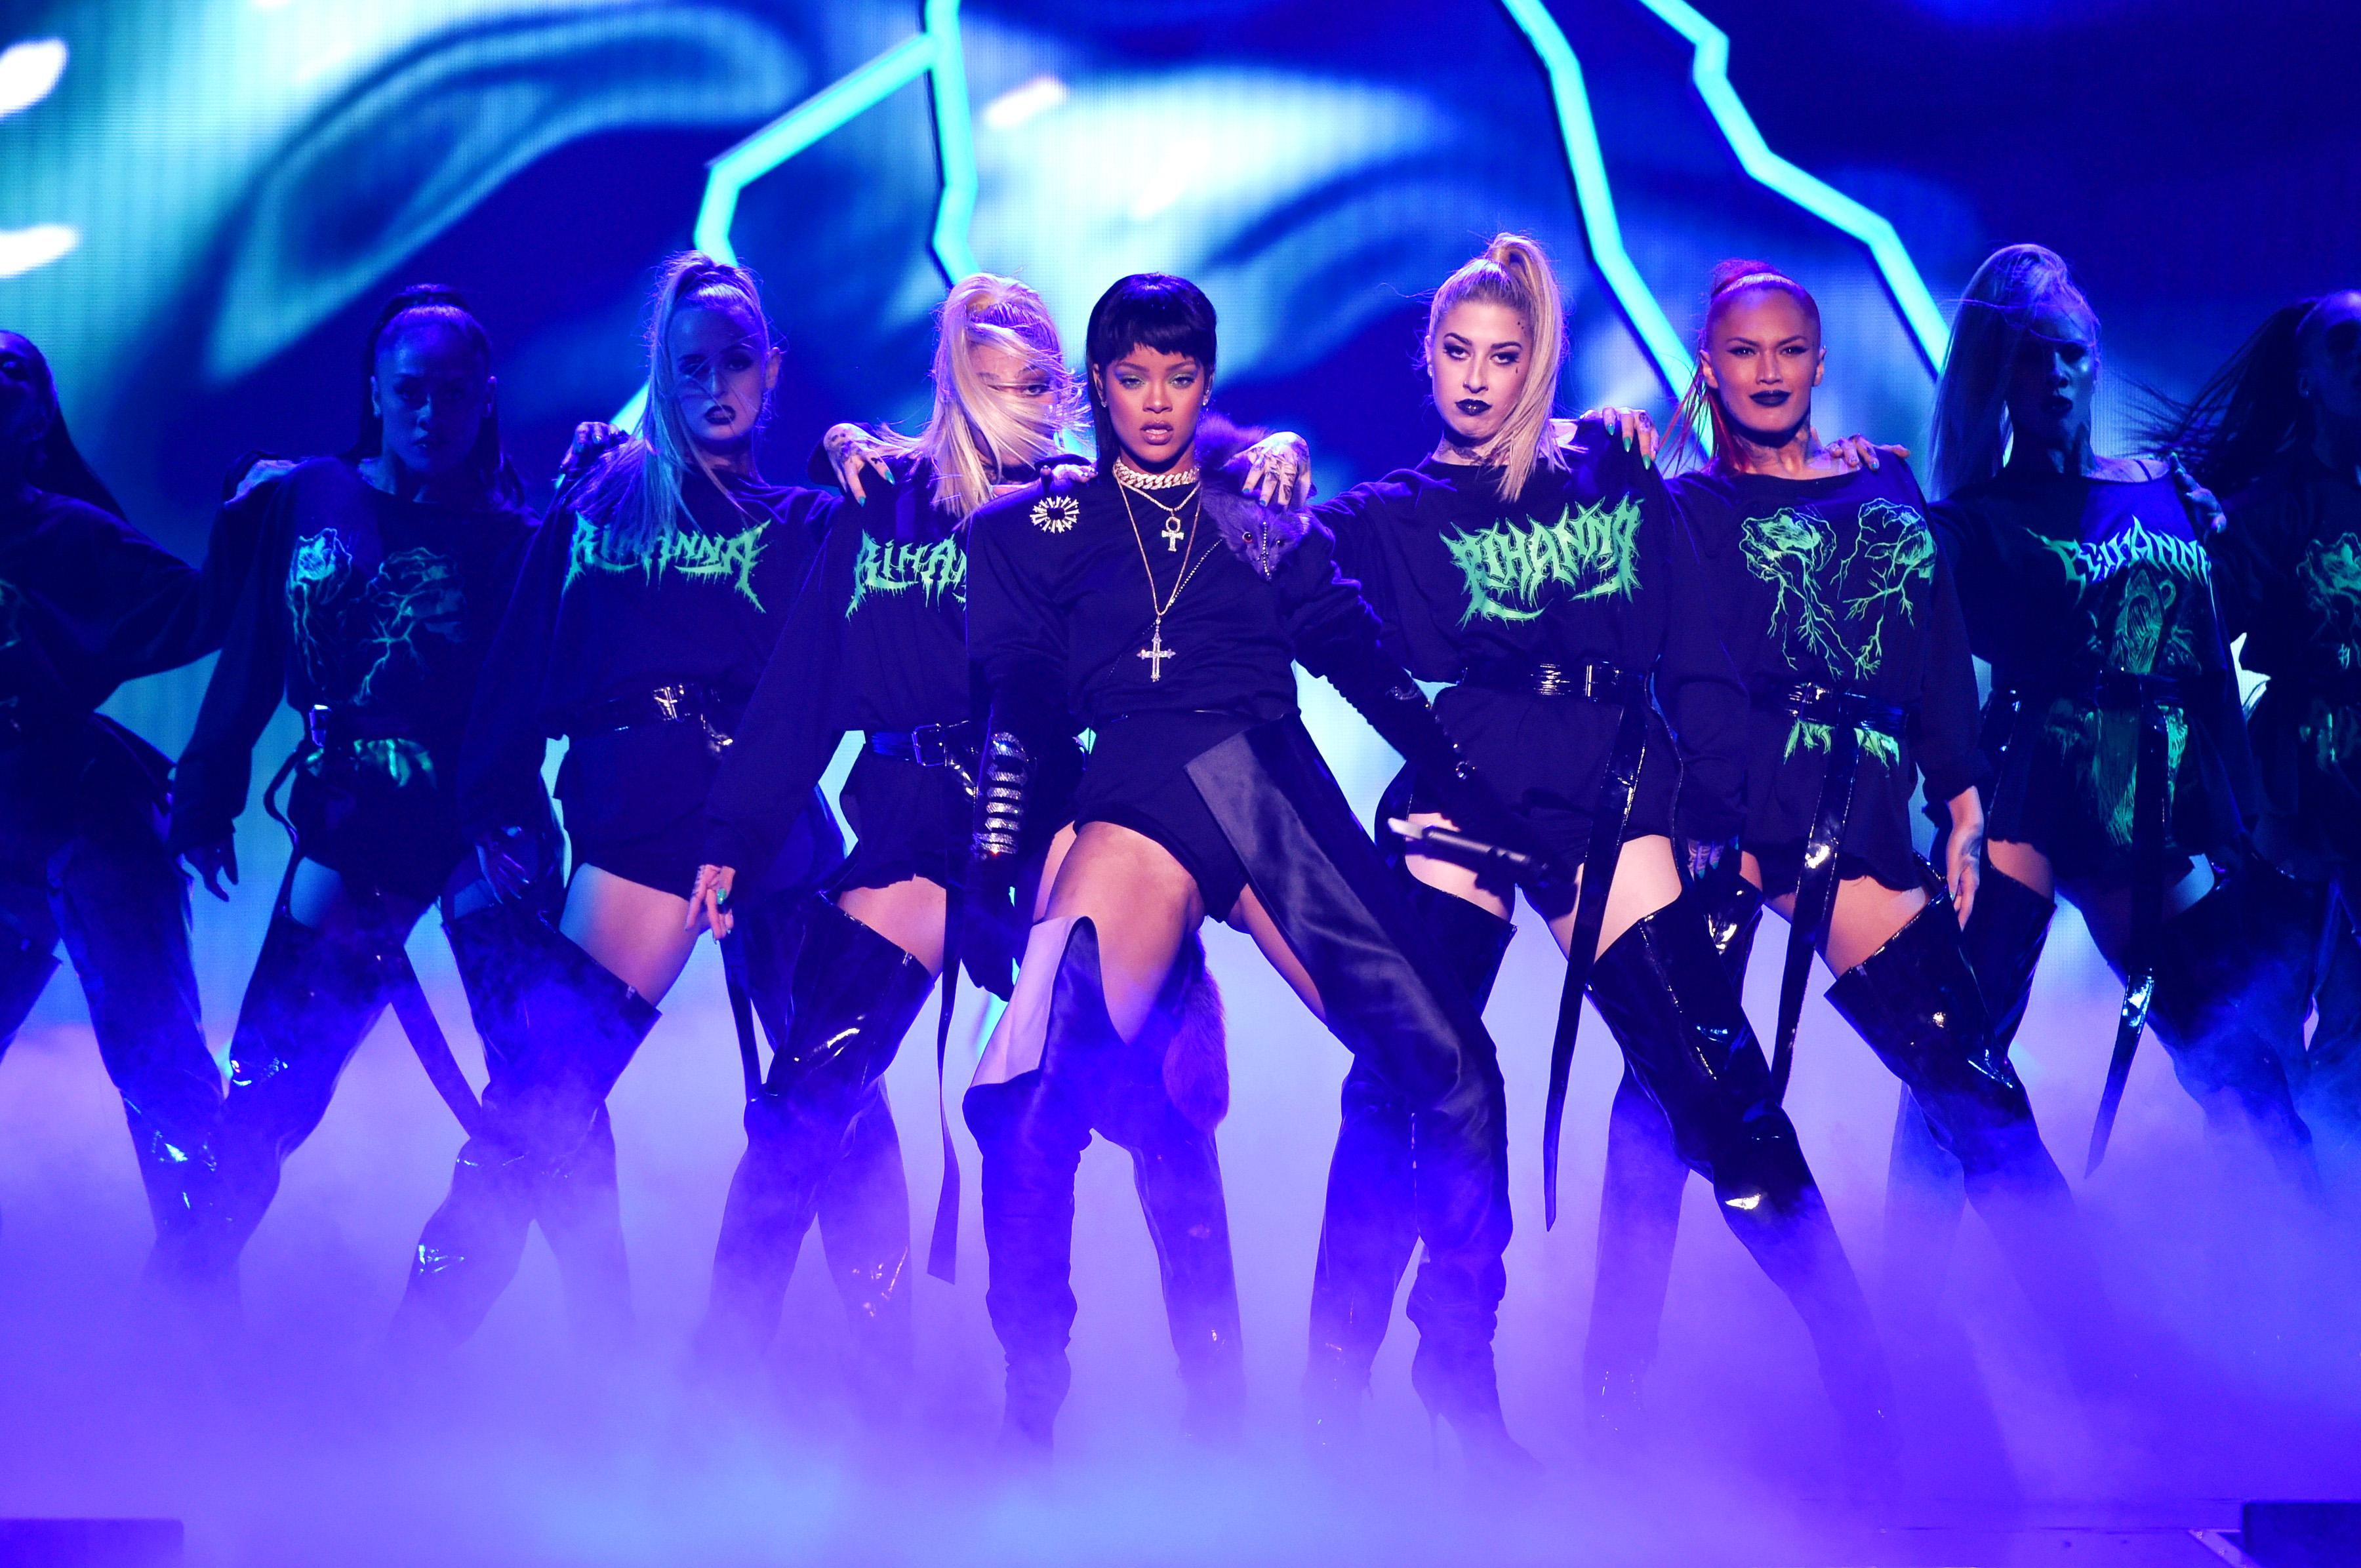 2016 MTV Video Music Awards - Inside